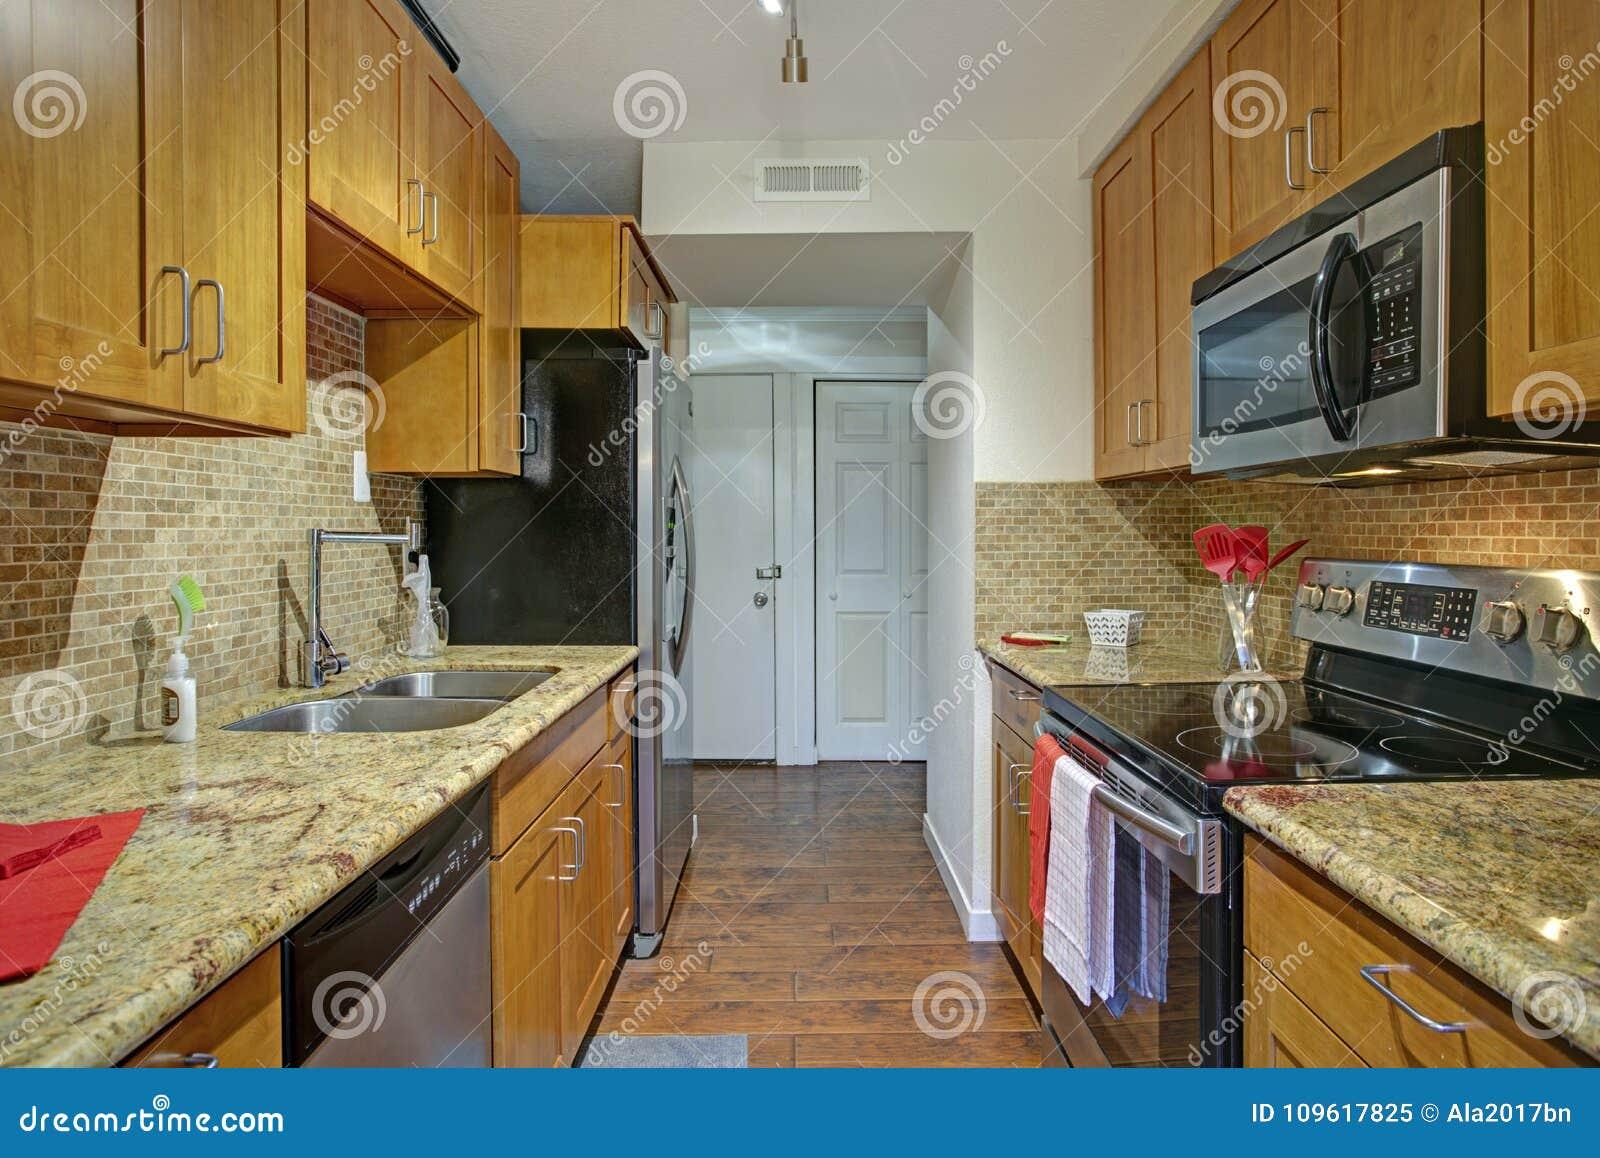 Small Galley Kitchen Design With Black Kitchen Appliances Stock ...